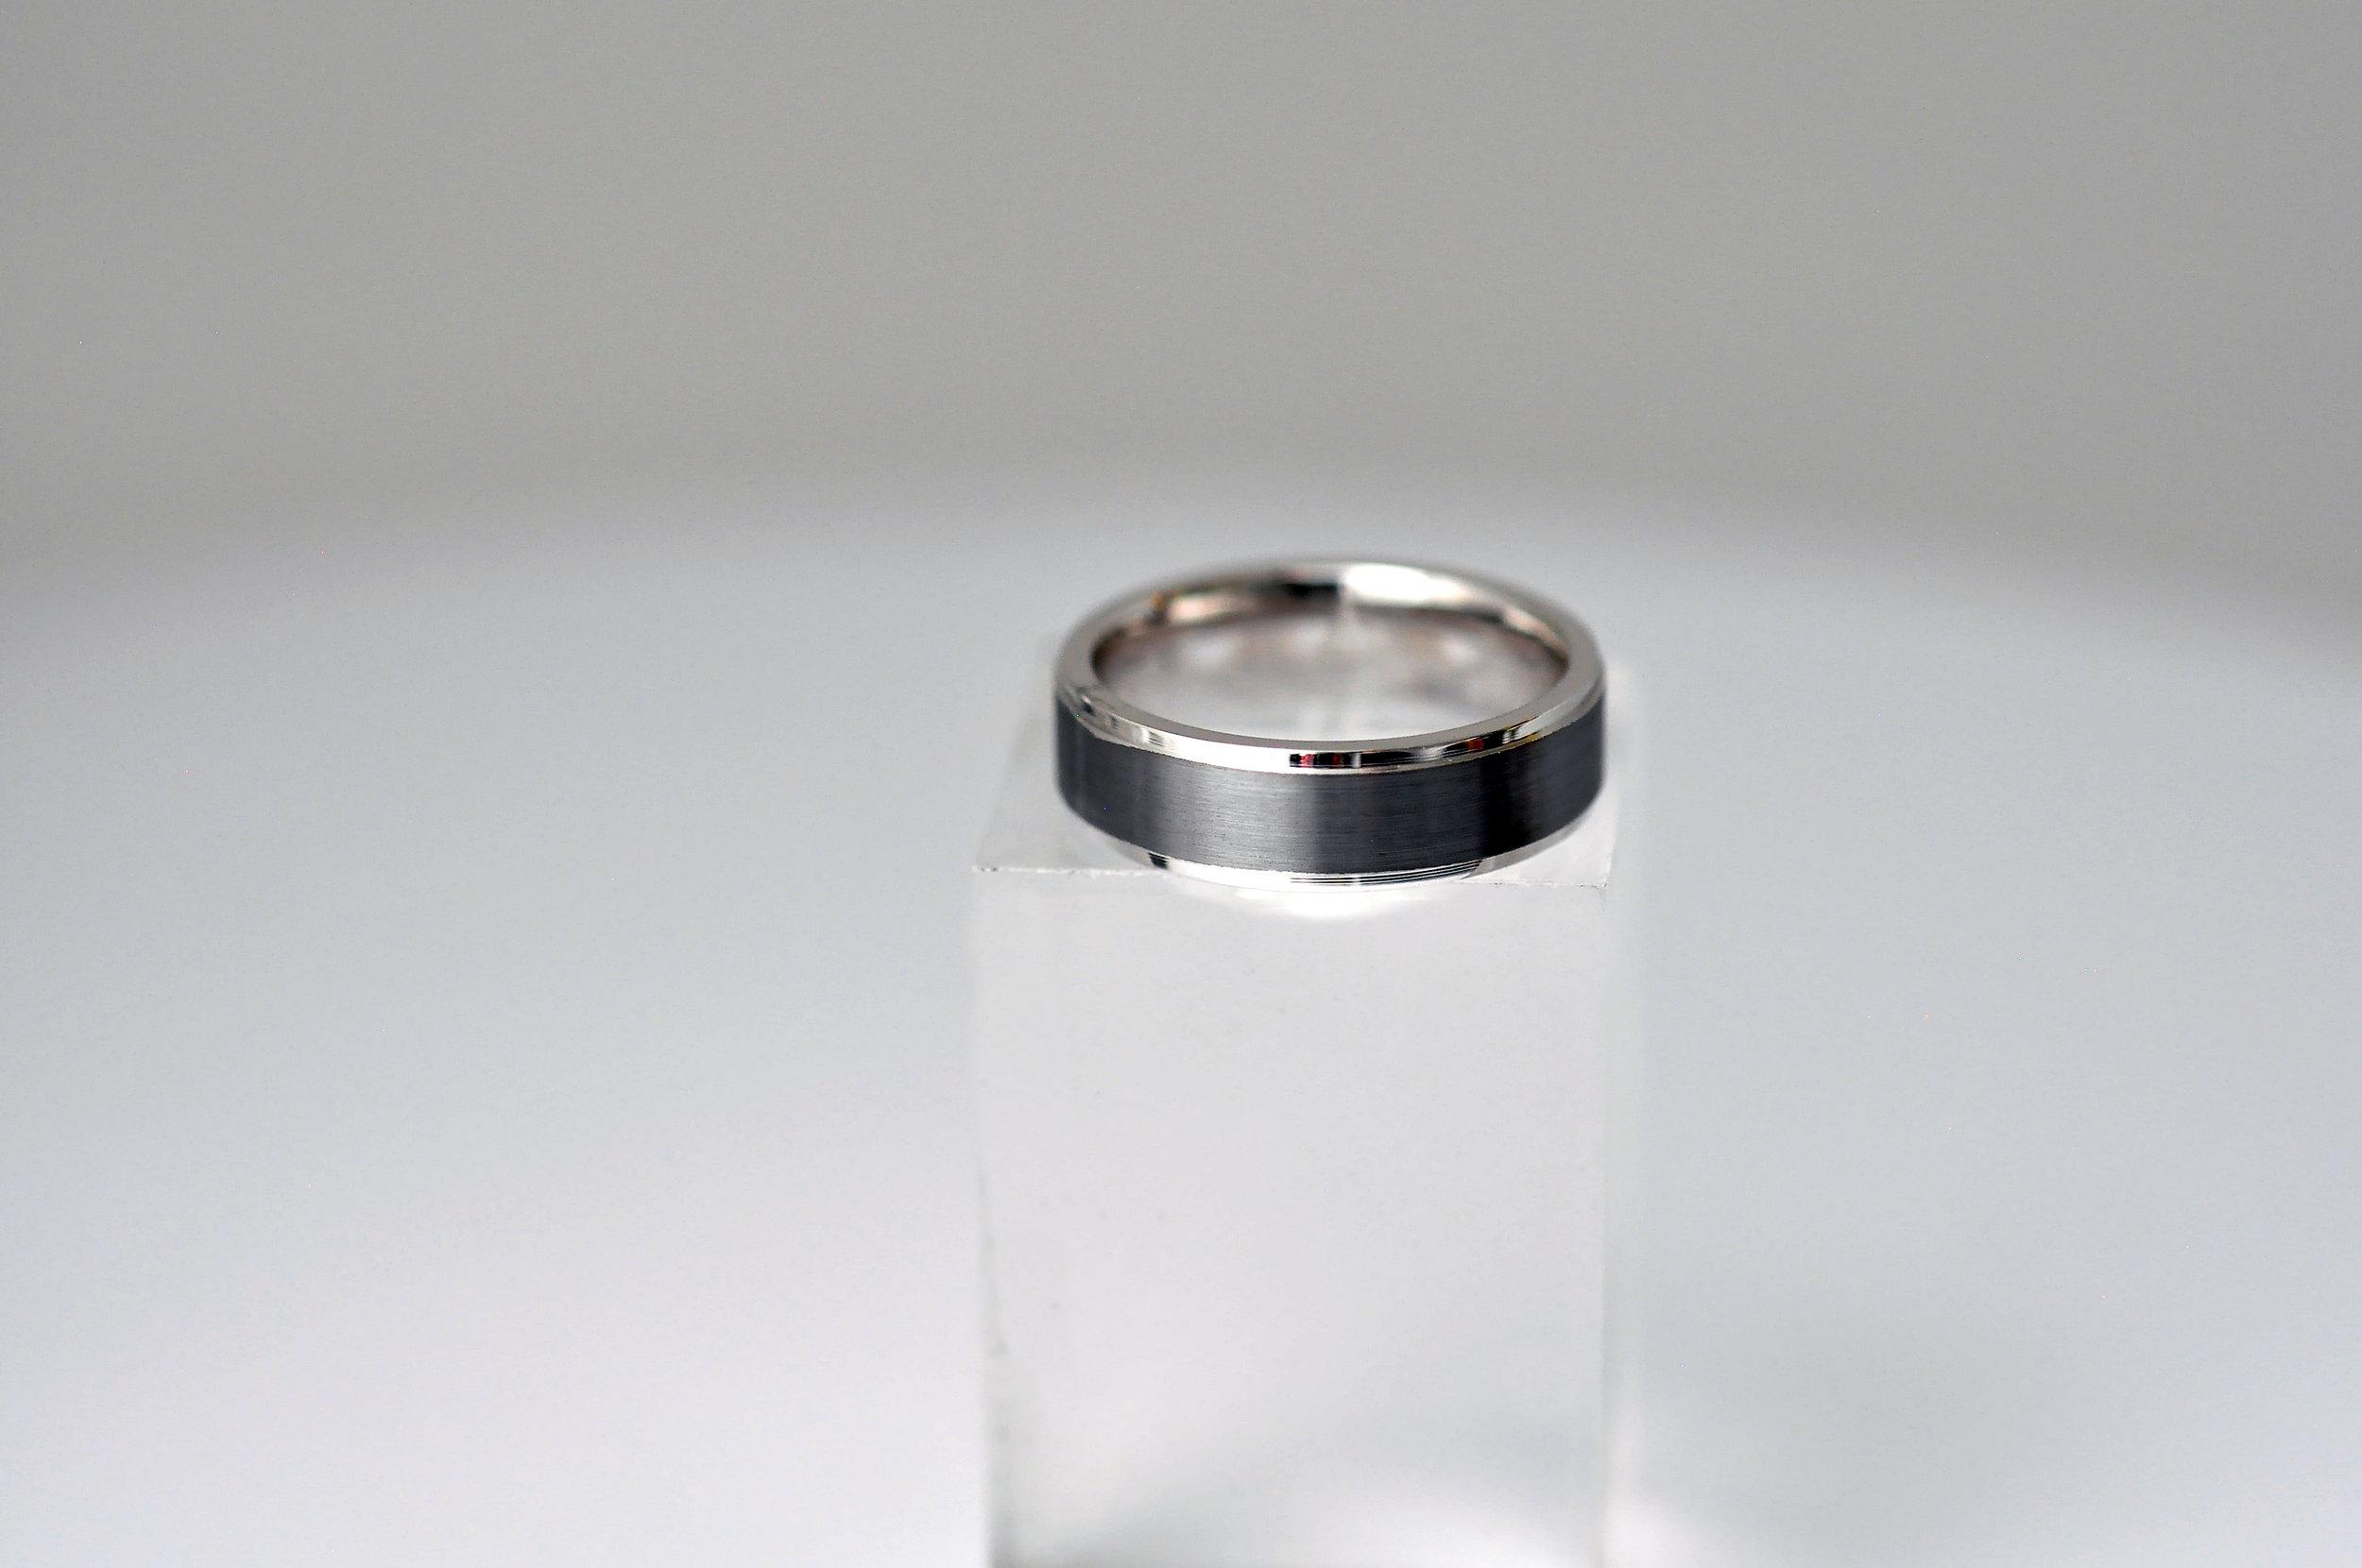 Black Men's Wedding Ring Toronto.jpg